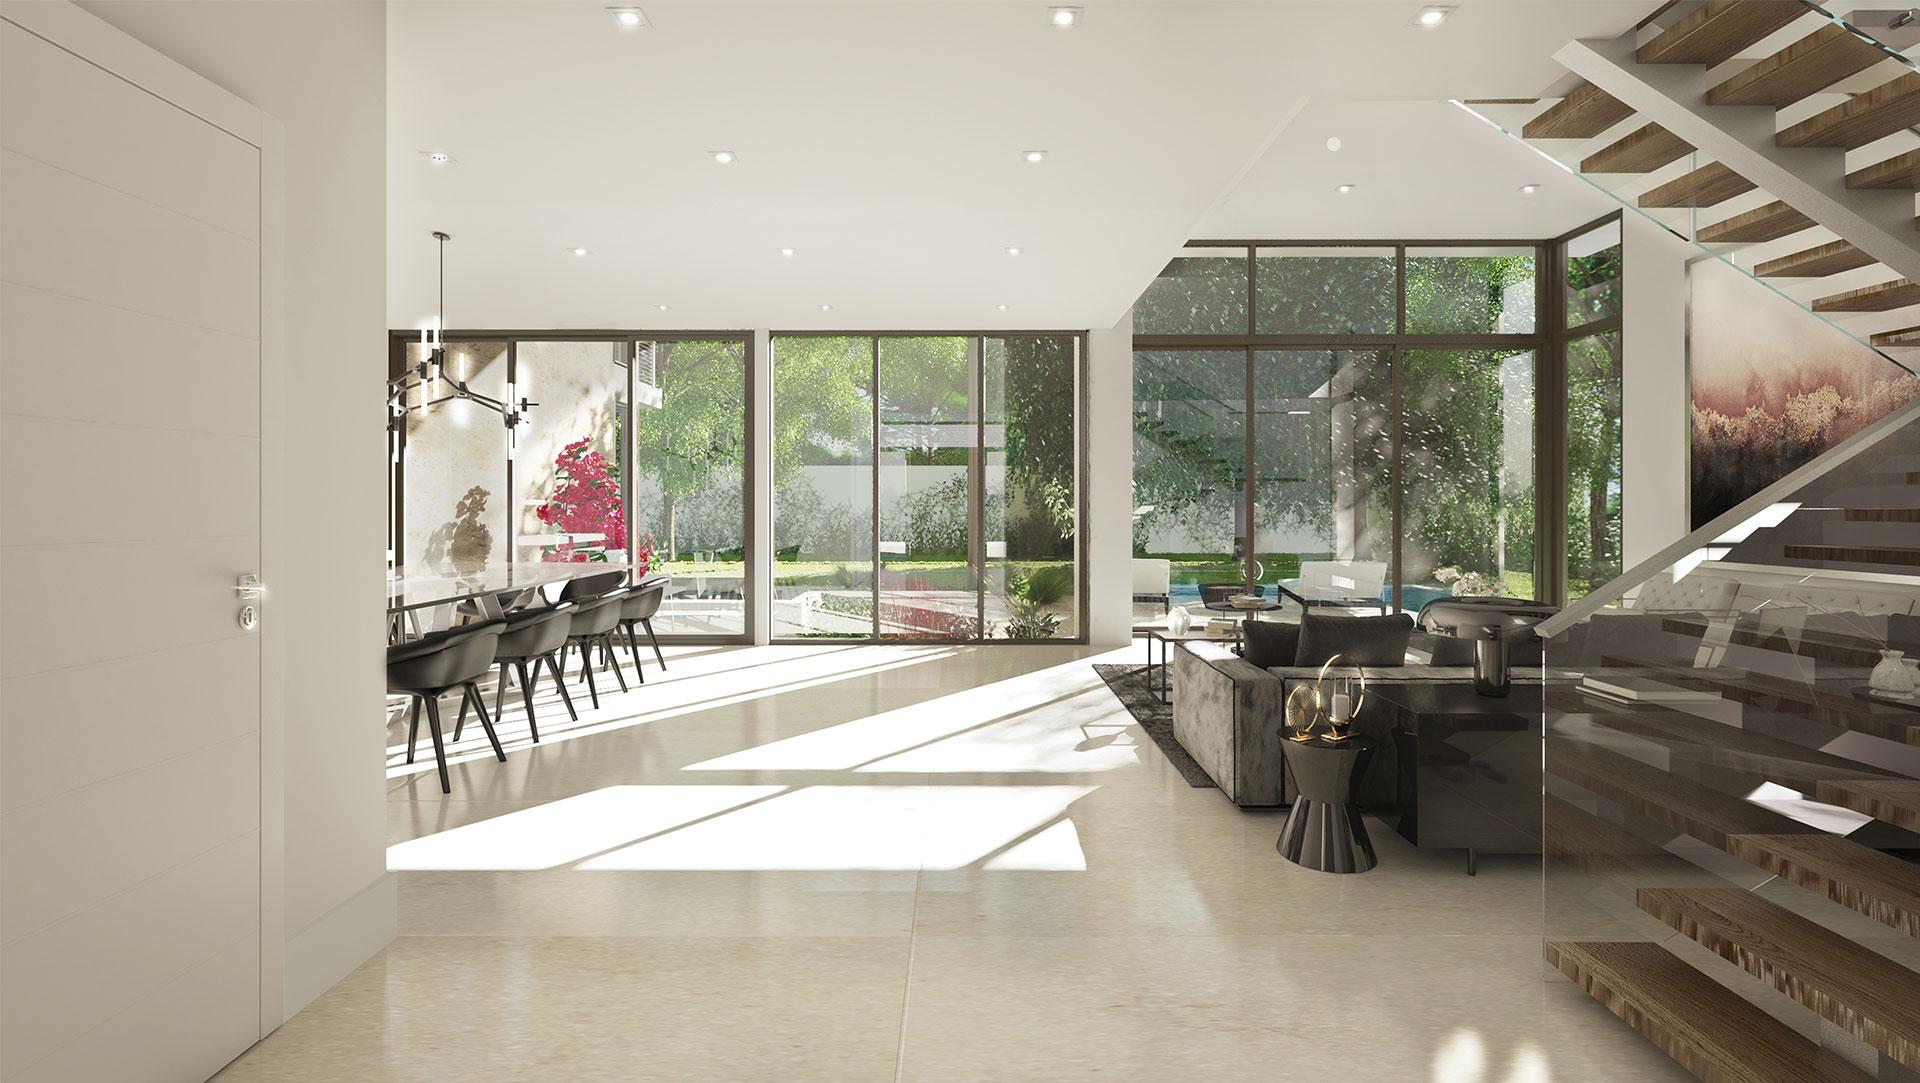 Interior Design living room project in Douglas RD, Florida